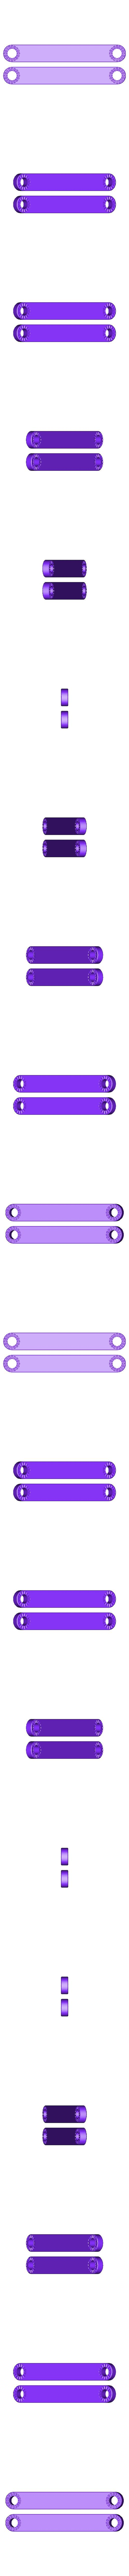 Arm Extender B v1.stl Télécharger fichier STL gratuit LiftPod - Support pliable multifonctionnel • Objet à imprimer en 3D, HeyVye